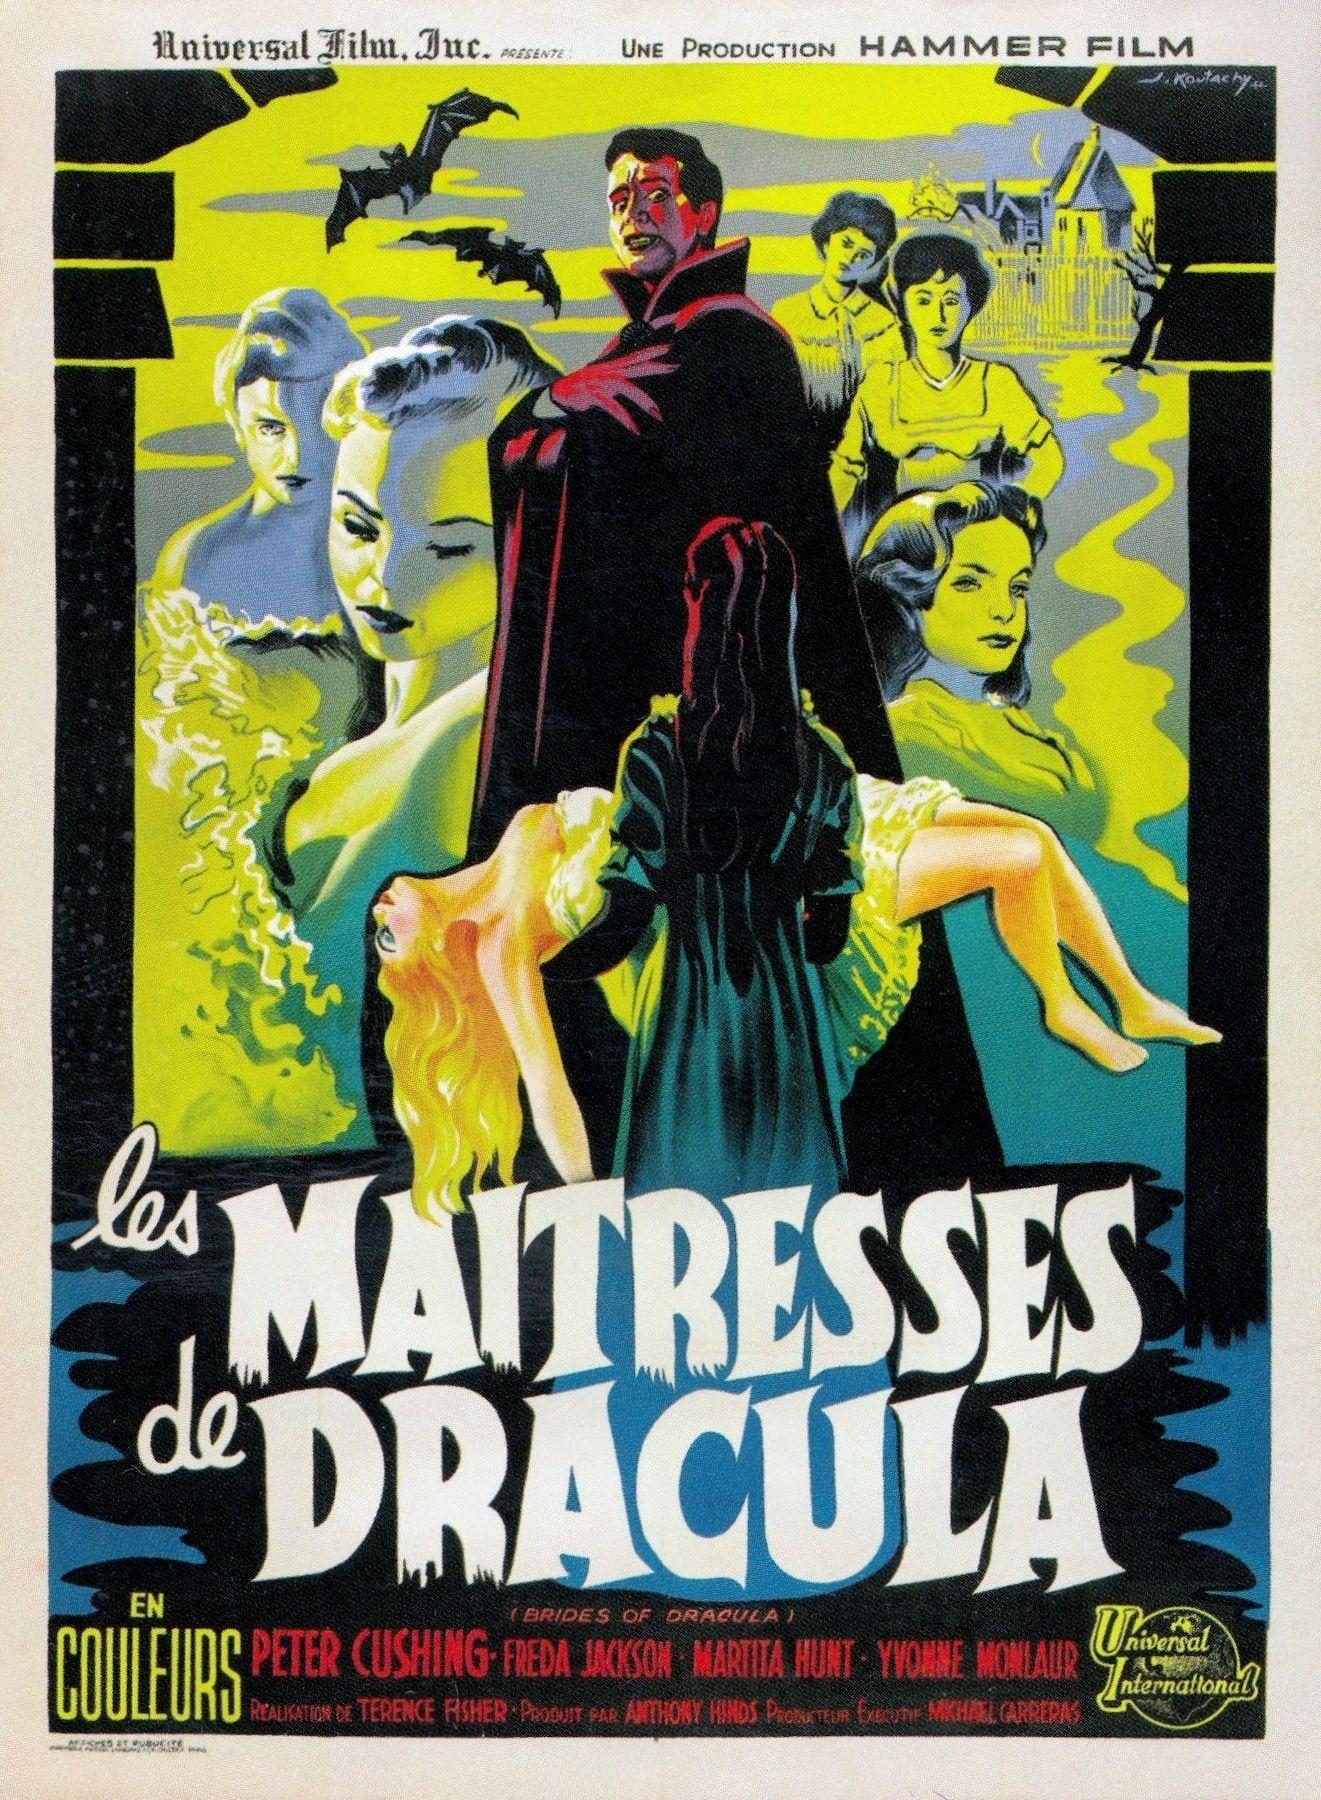 BRIDES OF DRACULA Movie Poster 1960 Vampires Horror Classic